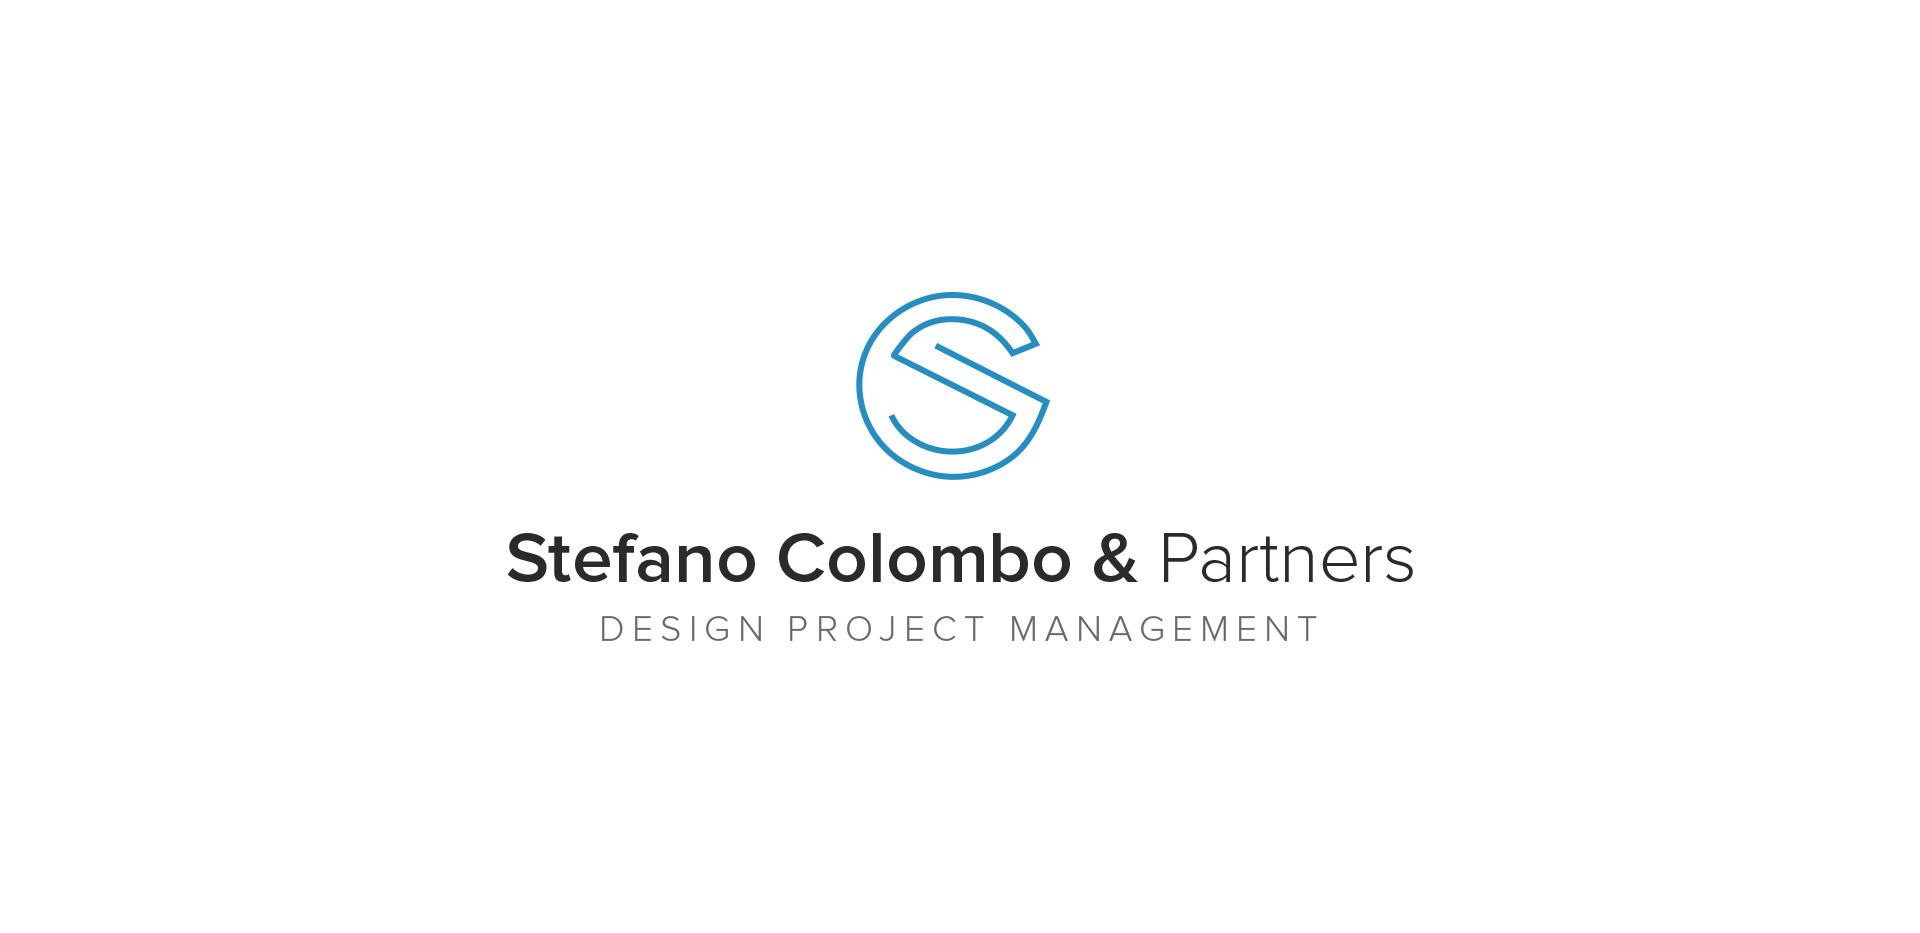 Professional logo creation